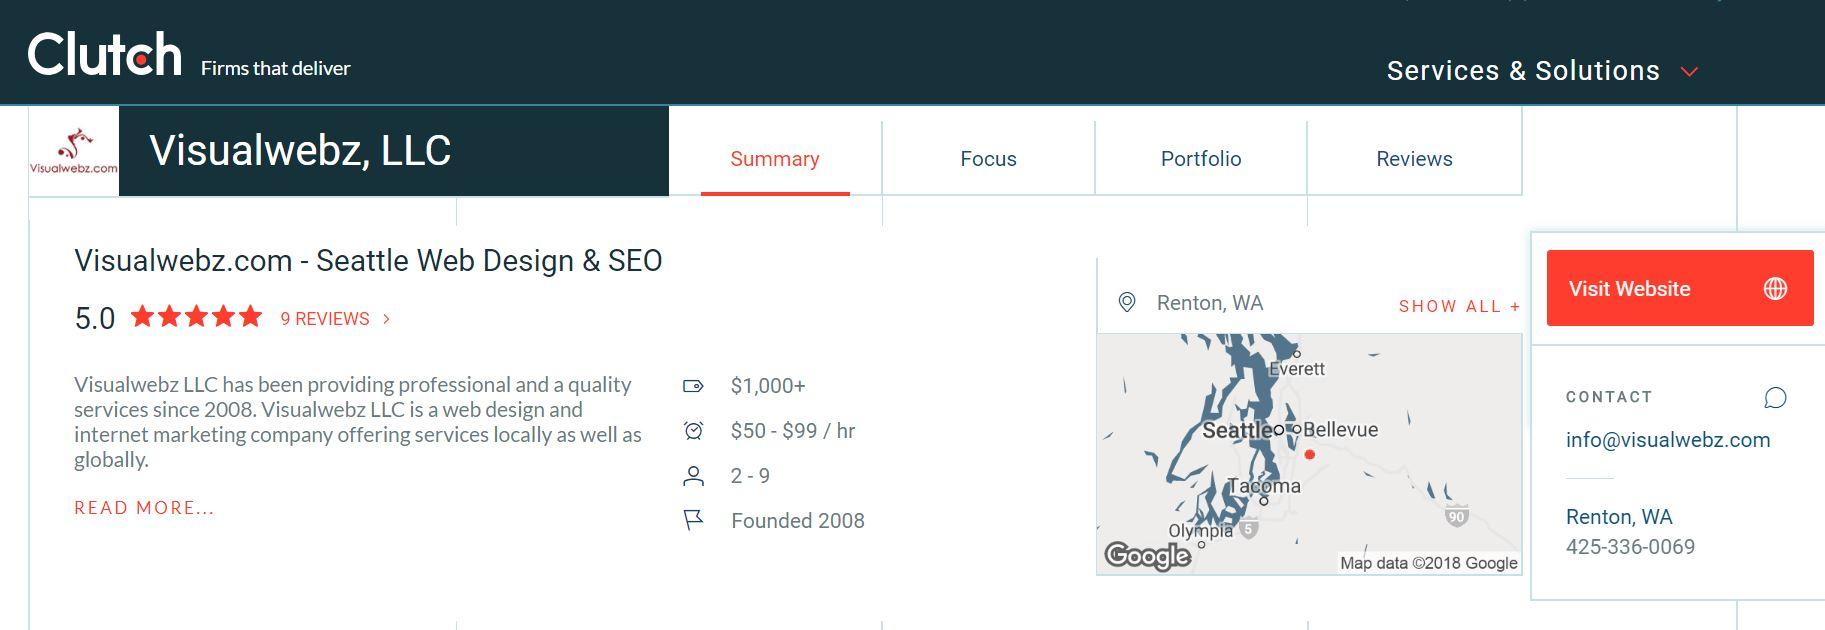 Top Web Designers USA Seattle Bellevue - Top Web Designers USA